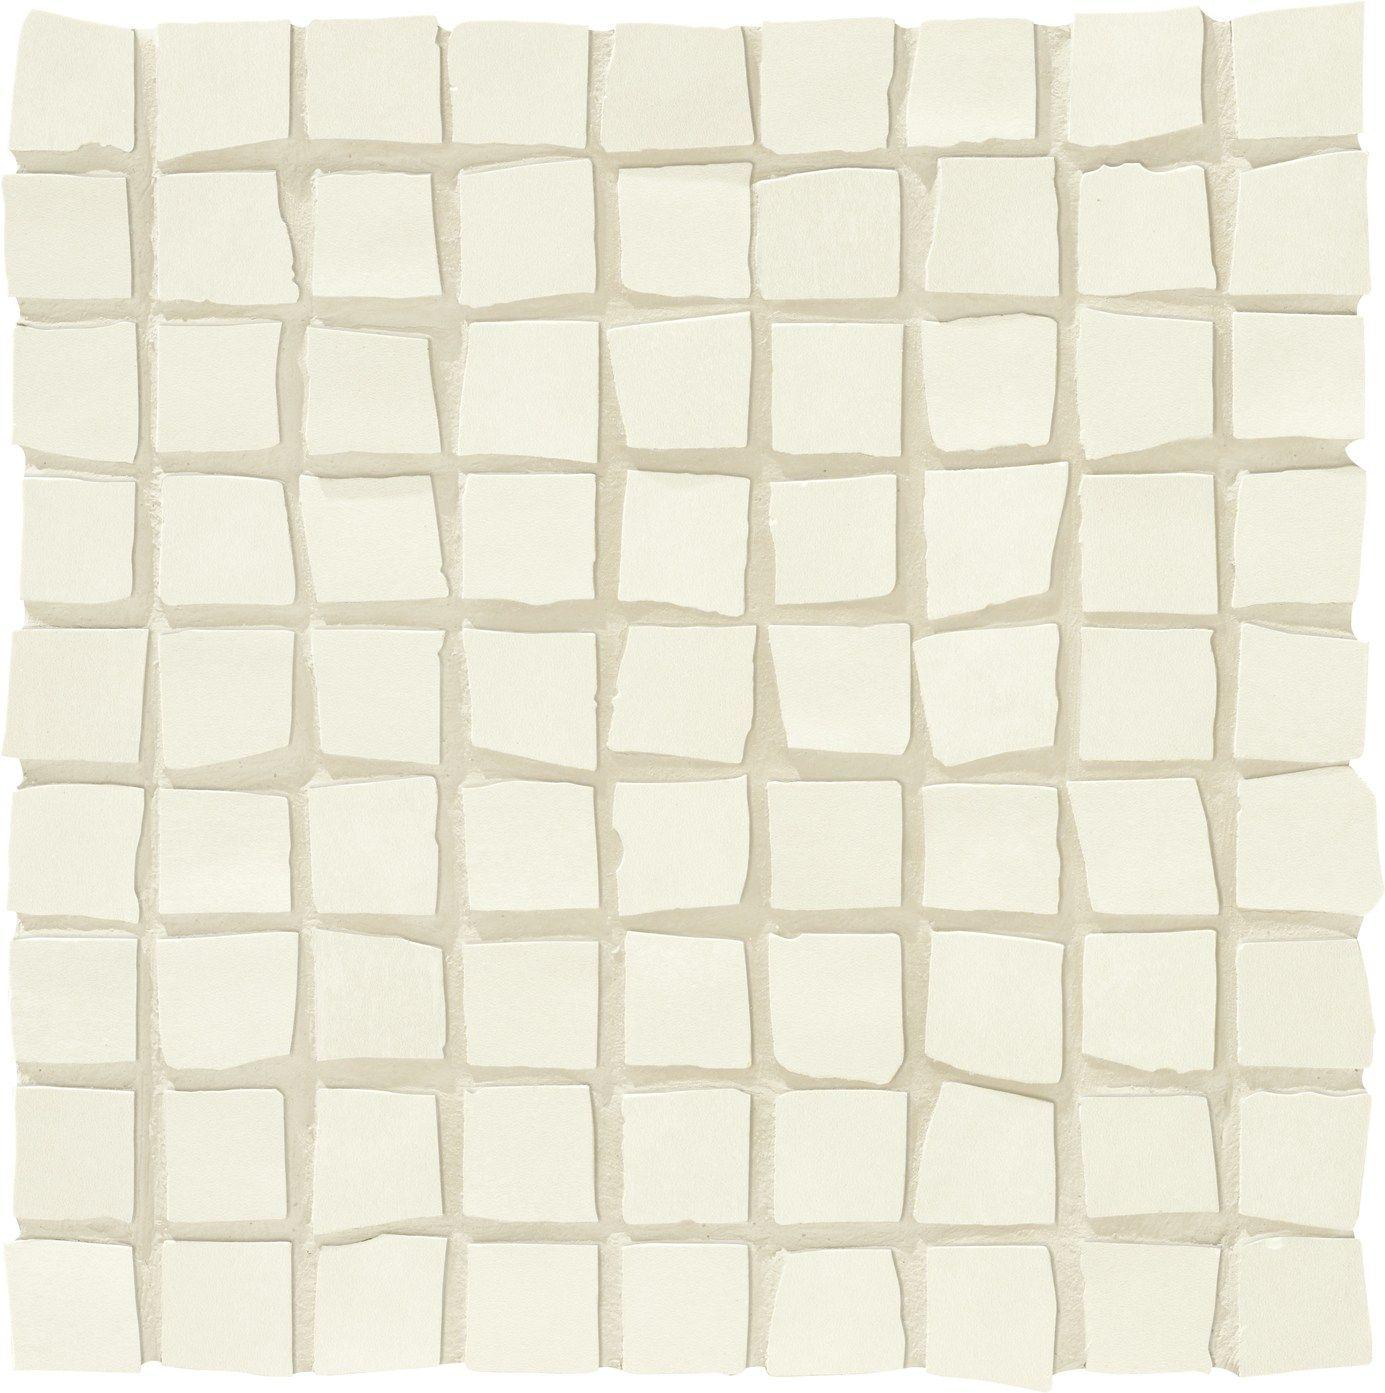 ground mosaic by love ceramic tiles. Black Bedroom Furniture Sets. Home Design Ideas